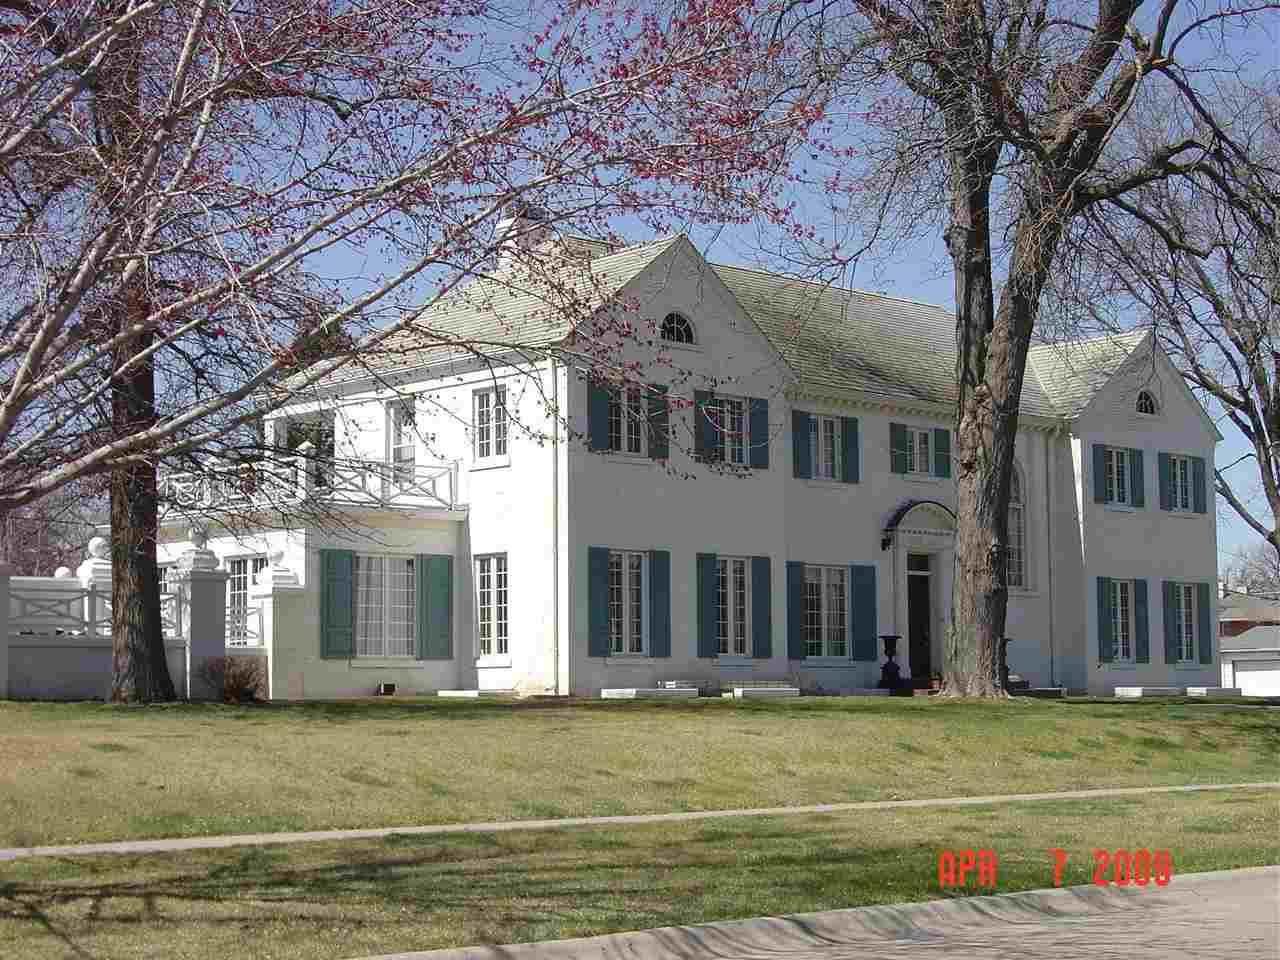 Real Estate for Sale, ListingId: 30164486, Hastings,NE68901